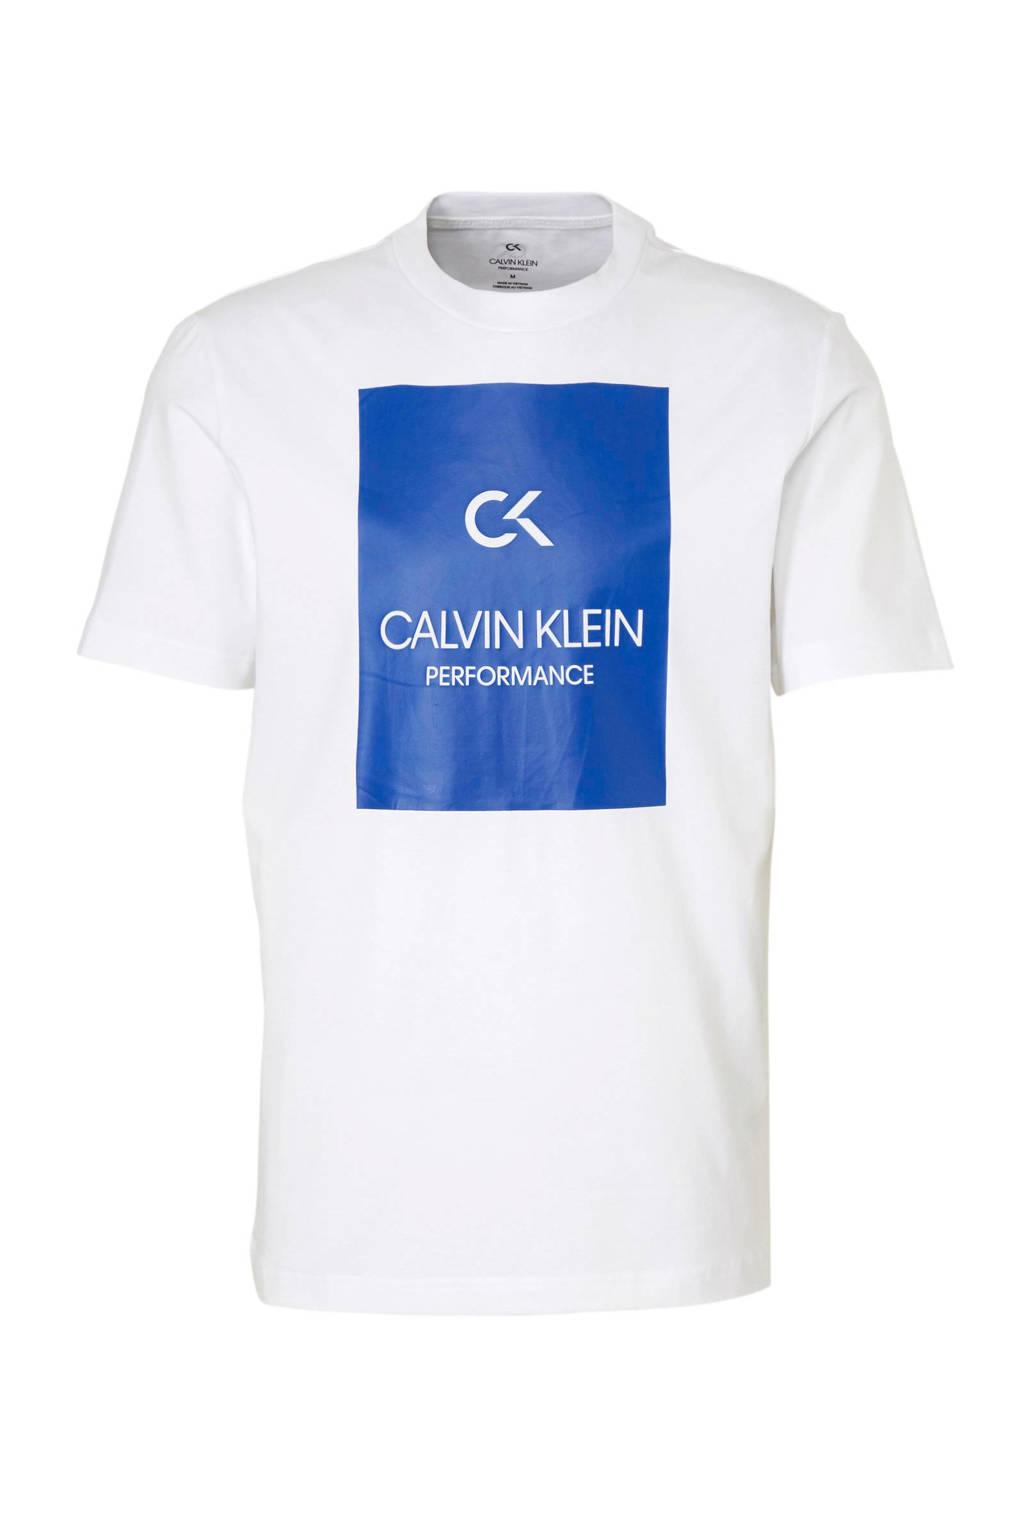 Calvin Klein   sport T-shirt met printopdruk wit/kobaltblauw, Wit/kobaltblauw